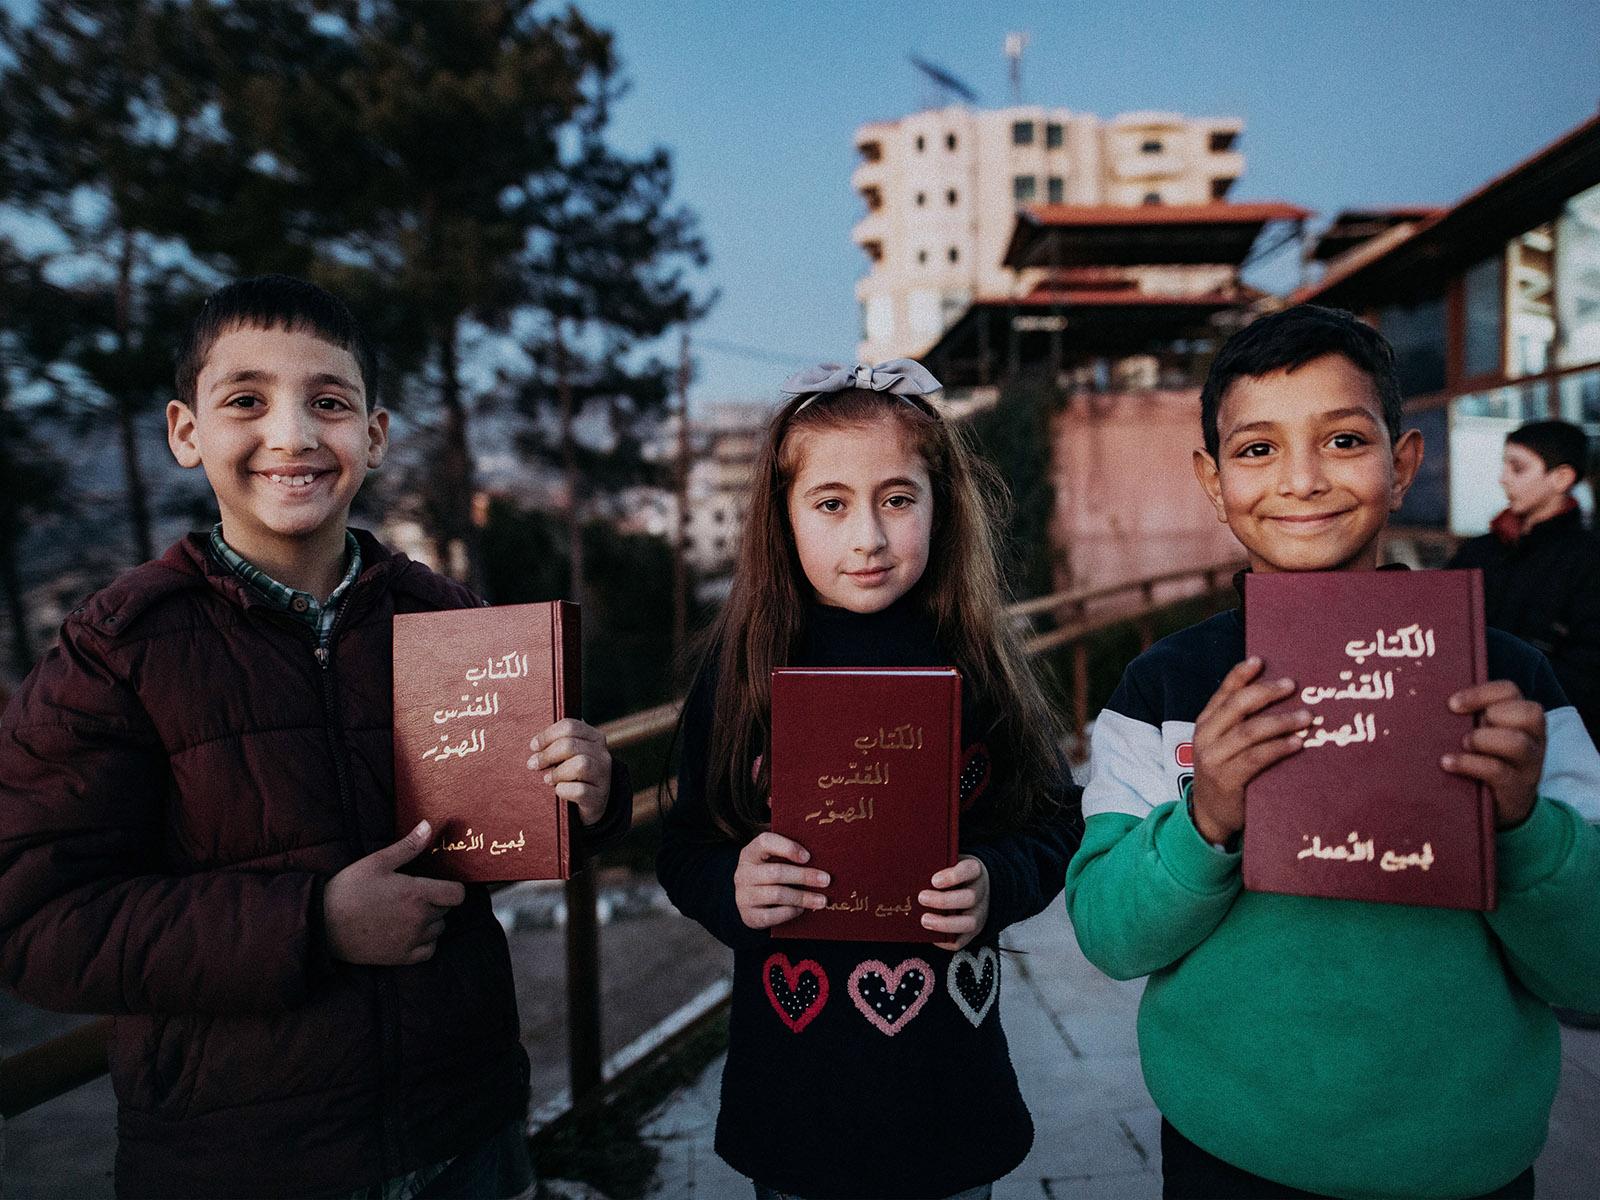 Syyialaisia lapsia Raamattujen kera